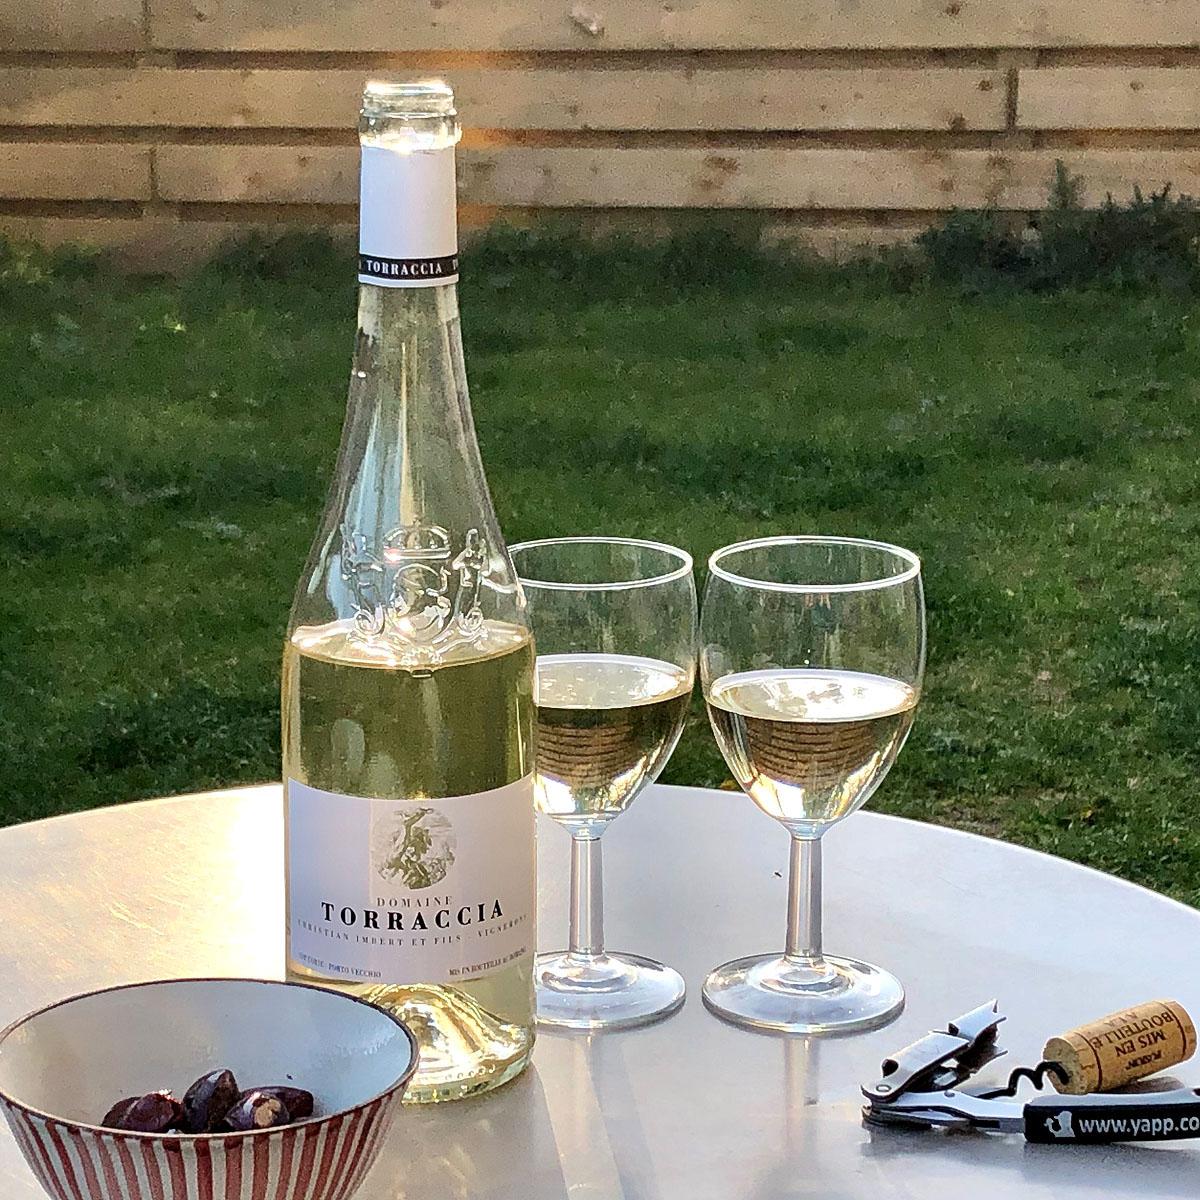 Vin de Corse Porto Vecchio: Domaine de Torraccia Blanc 2020 - Lifestyle